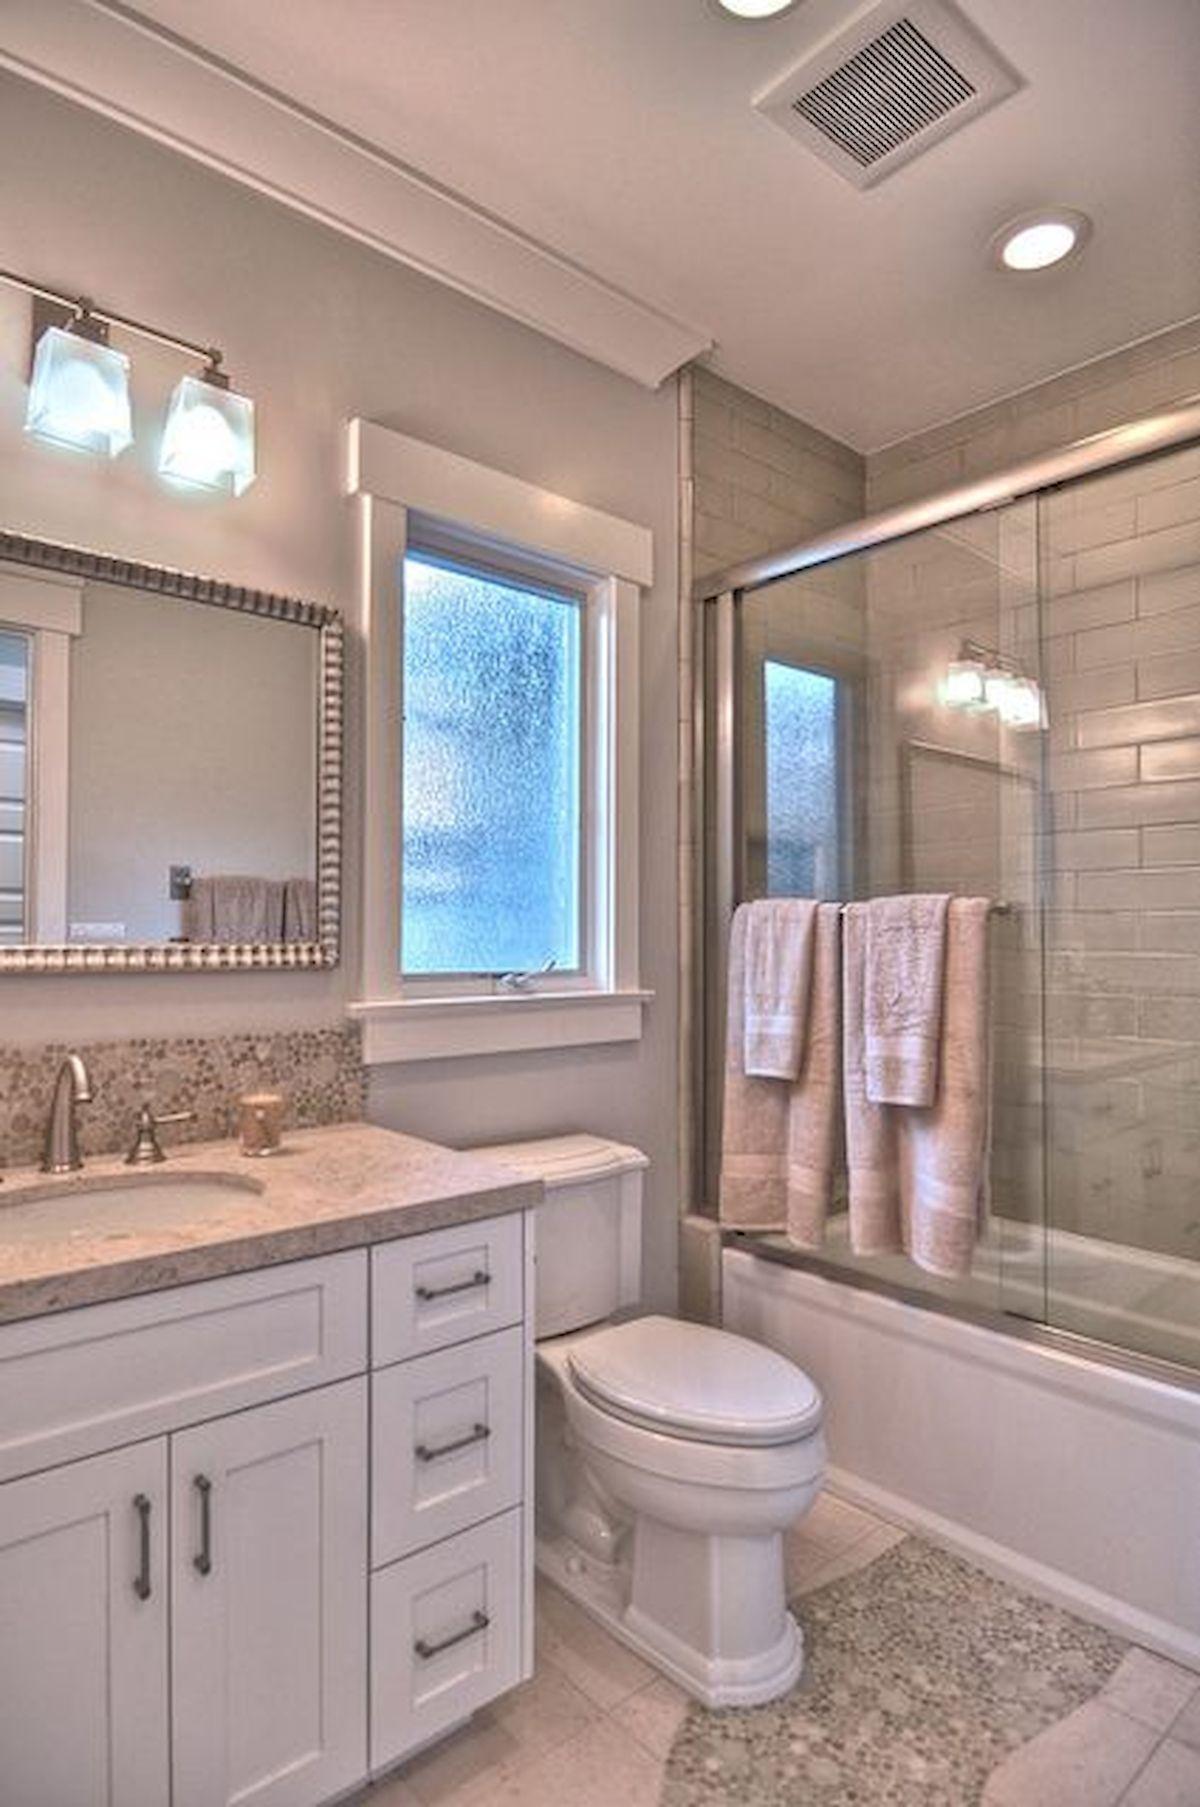 60 elegant small master bathroom remodel ideas 32